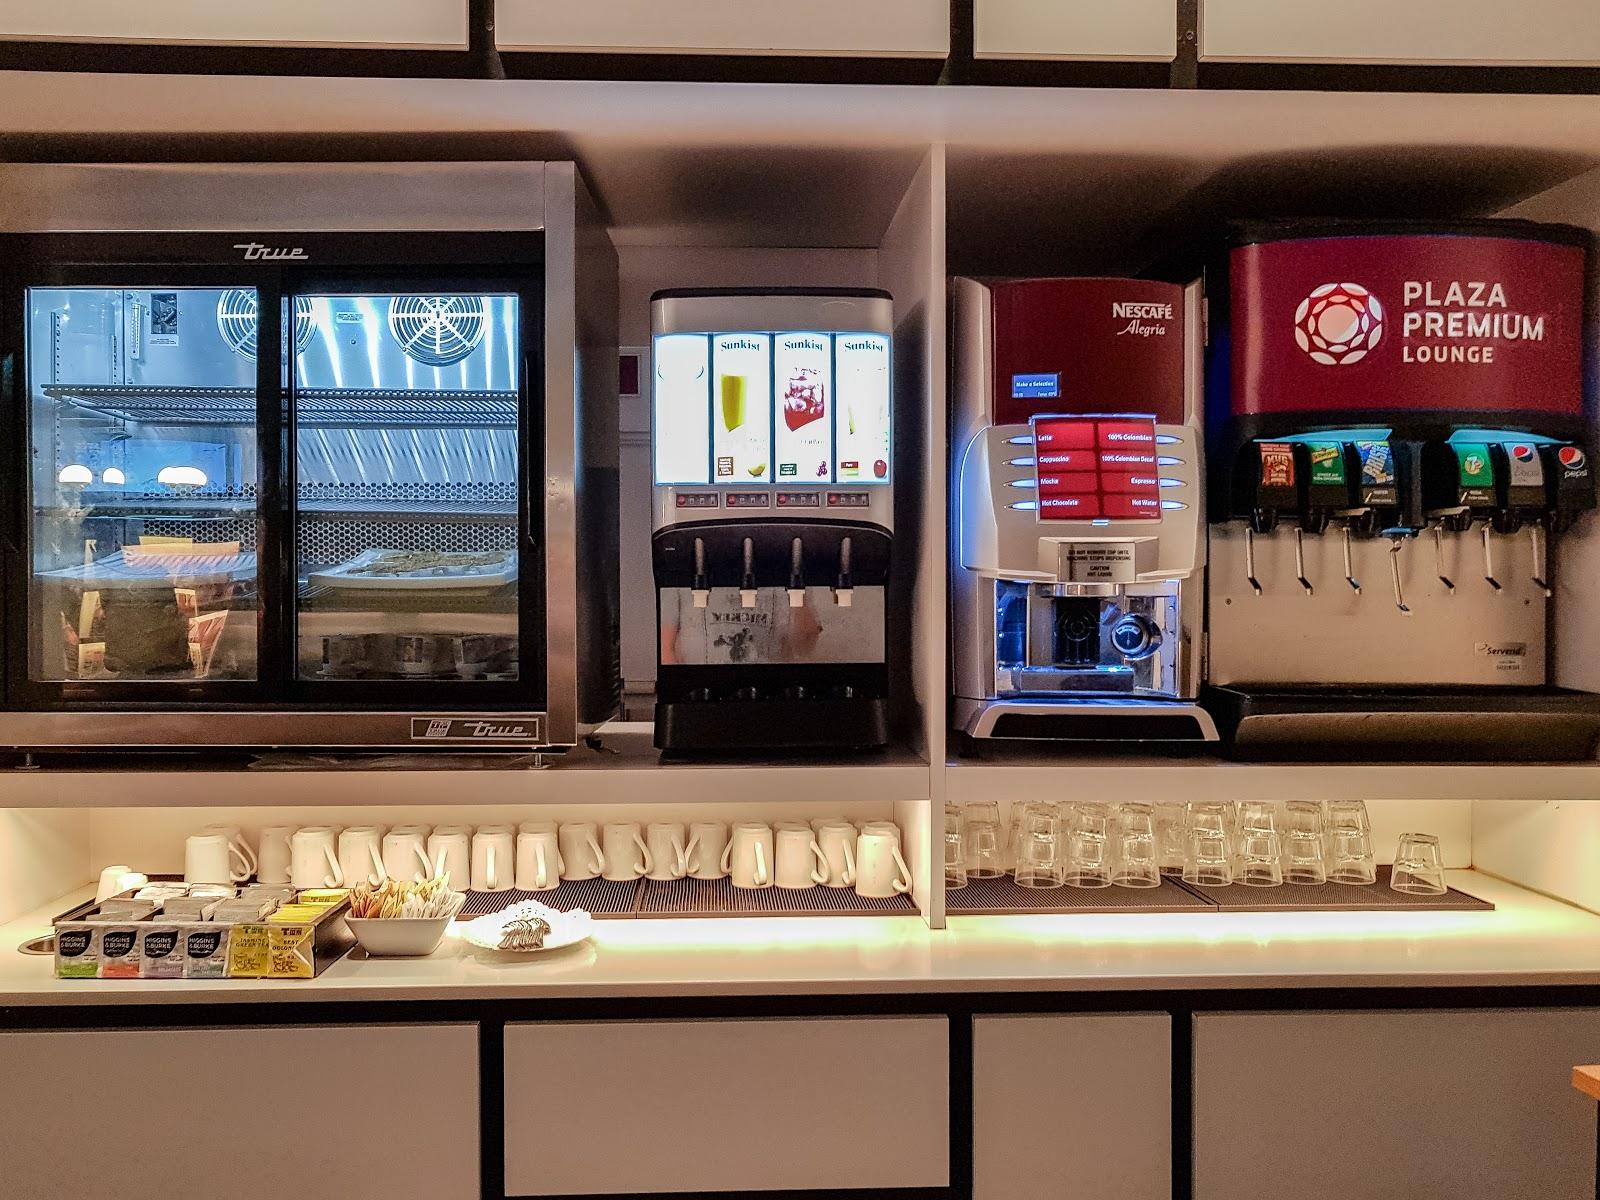 YYZ |多倫多機場第一航廈 環亞貴賓室 Plaza Premium Lounge